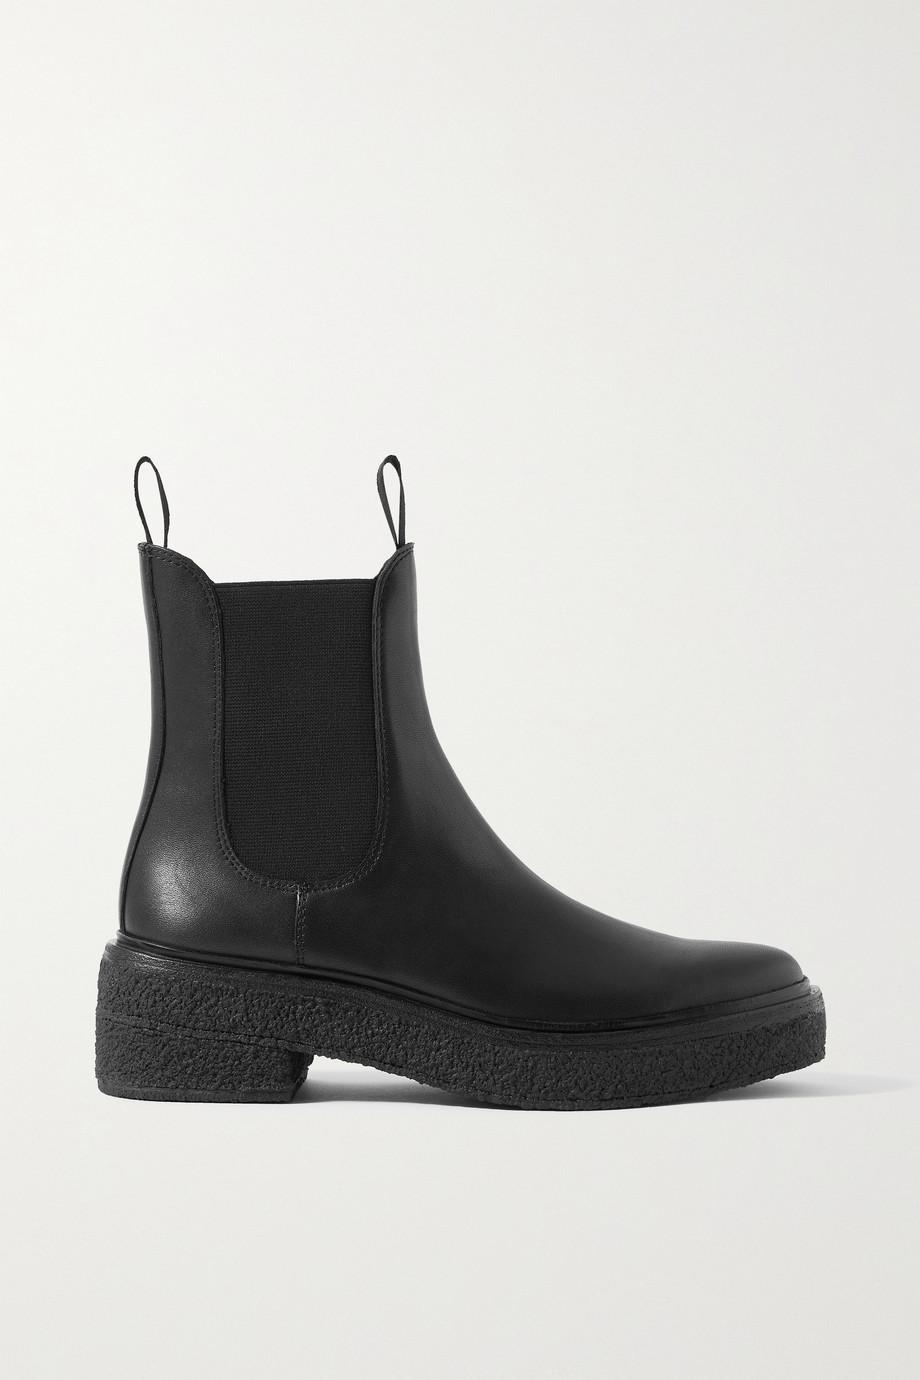 Loeffler Randall Raquel leather Chelsea boots